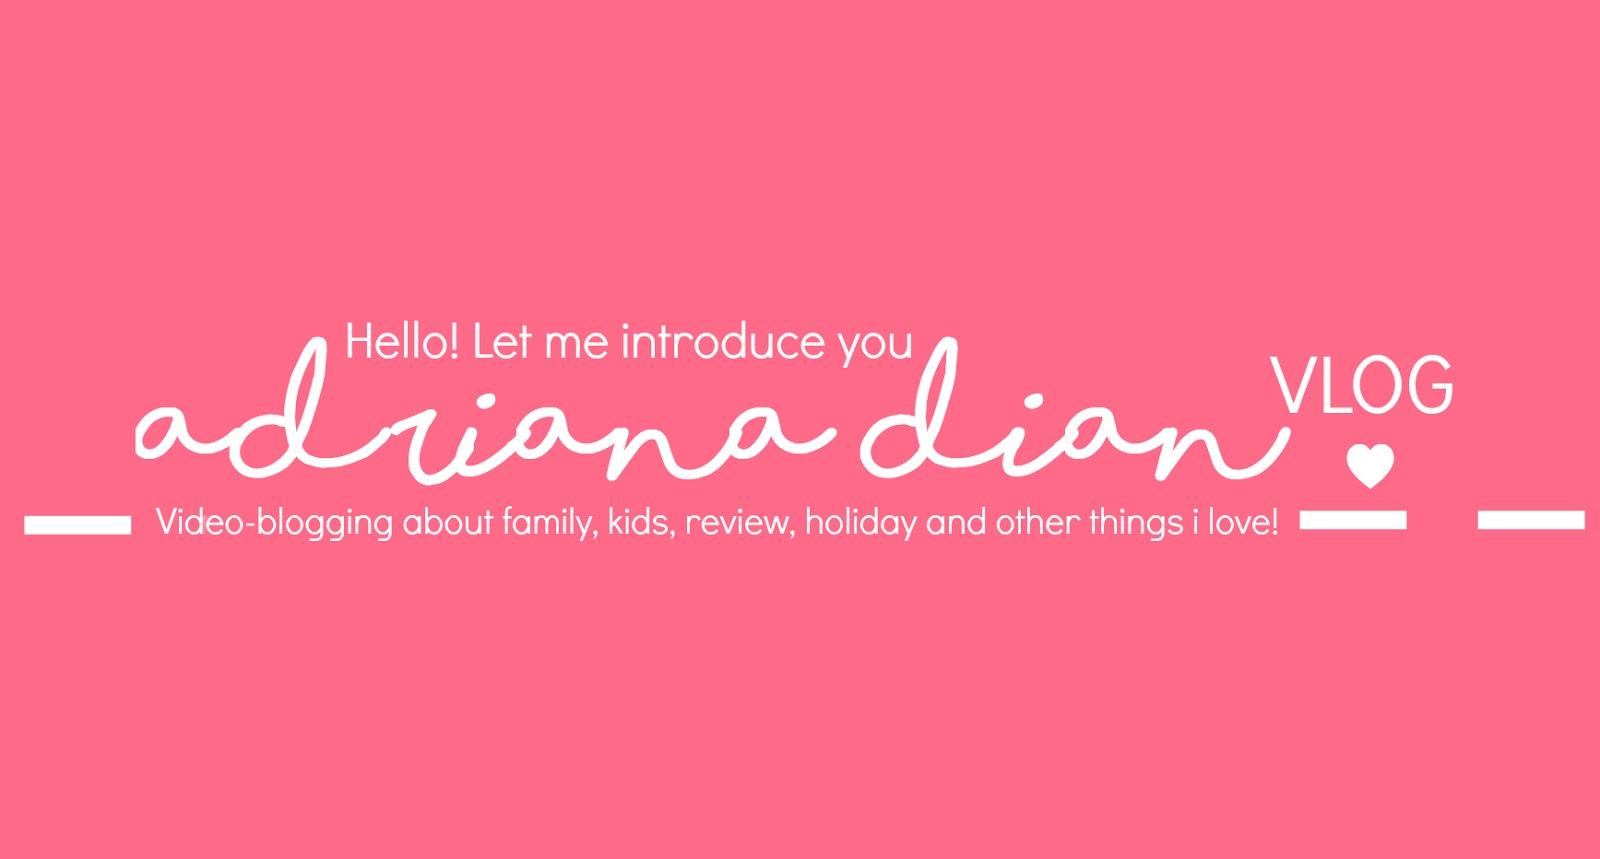 Adriana Dian Vlog